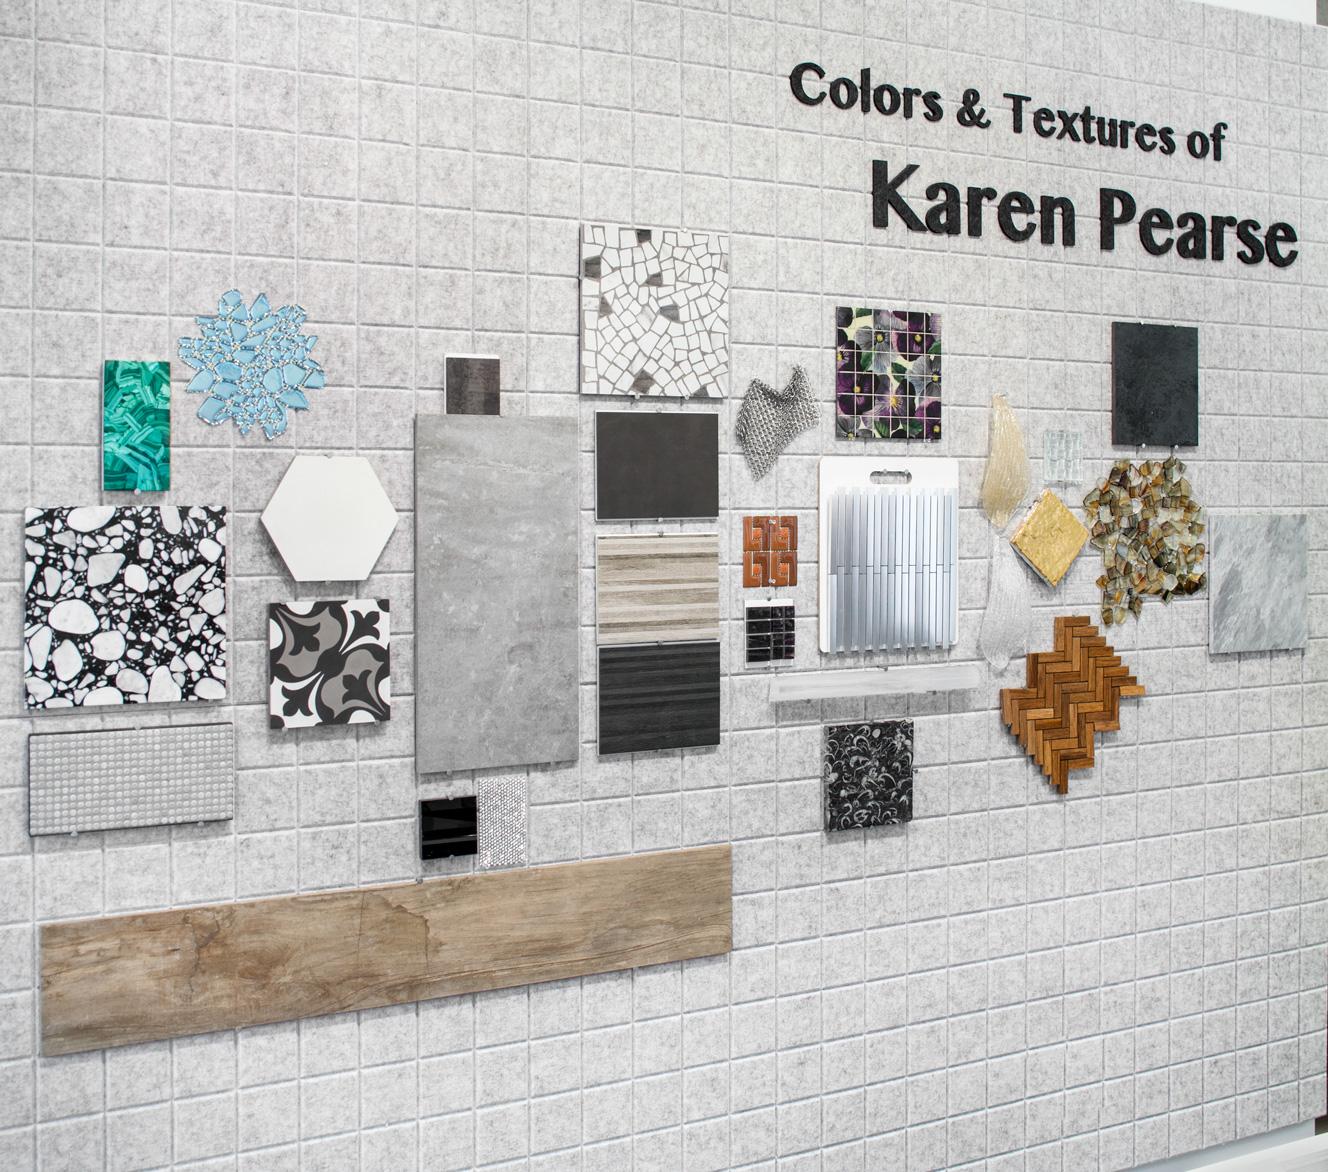 Karen Pearse Global Direct - HQ